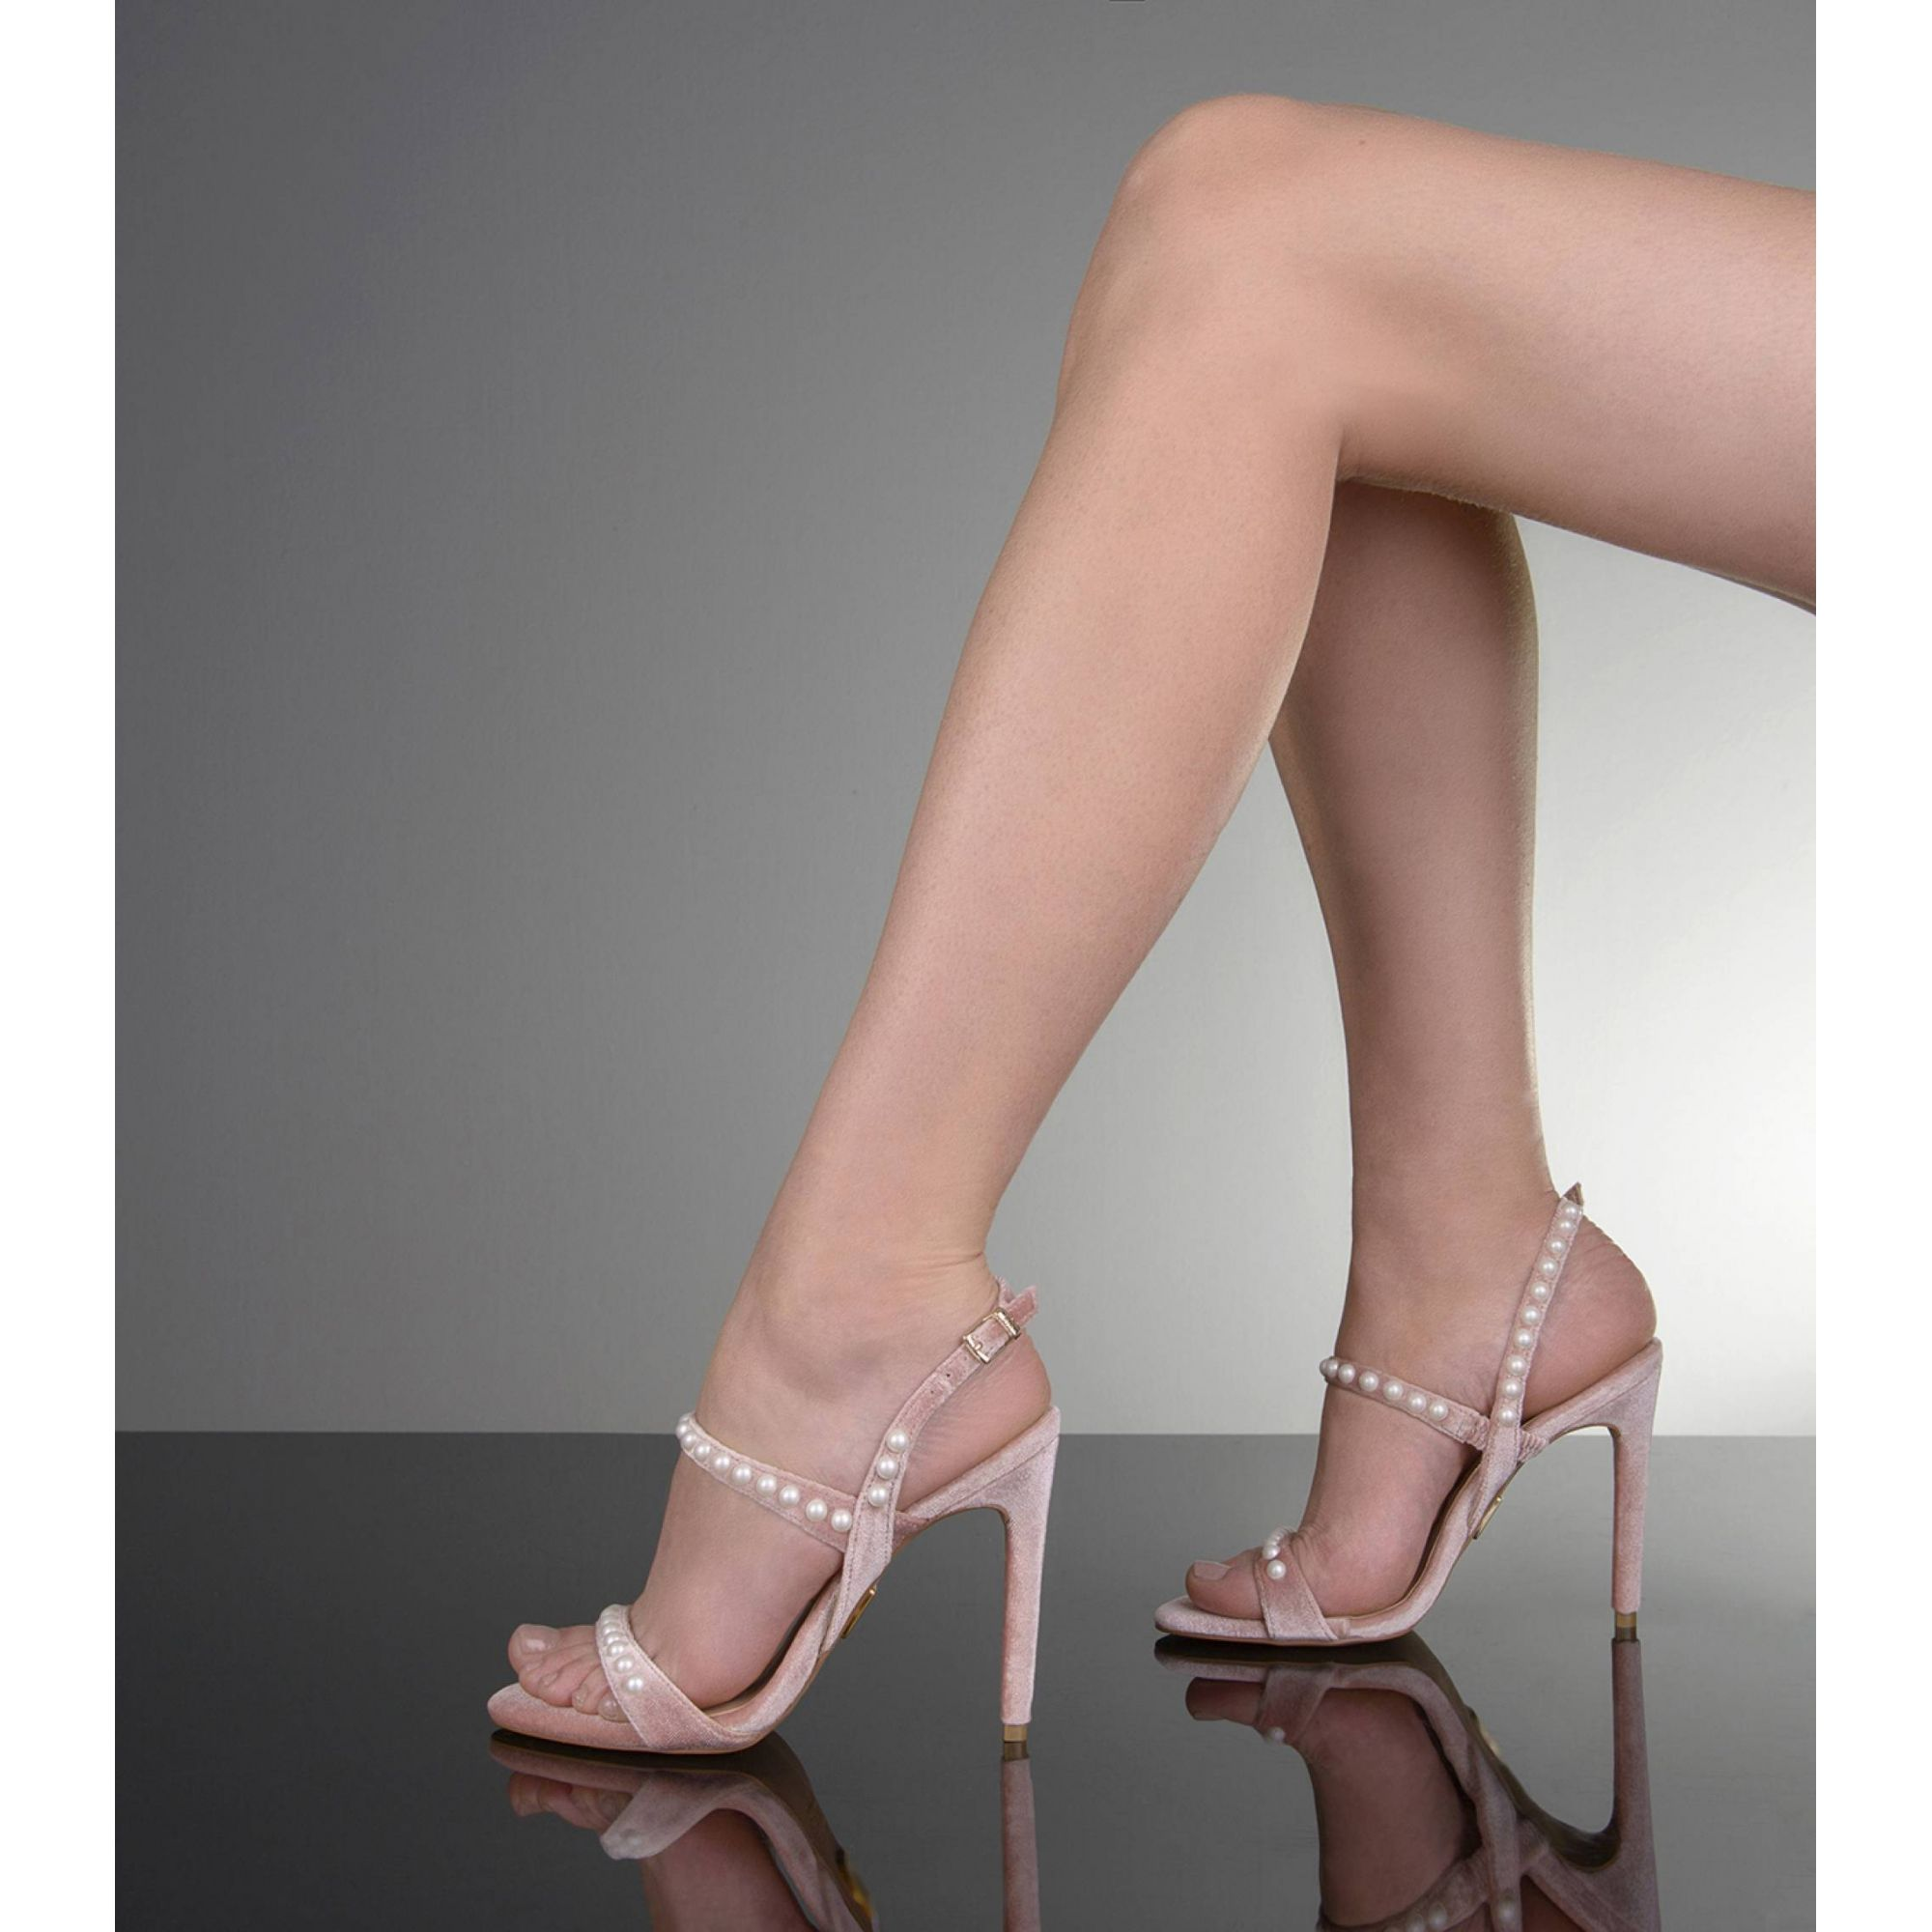 Sandália Salto Alto Velluto Nude